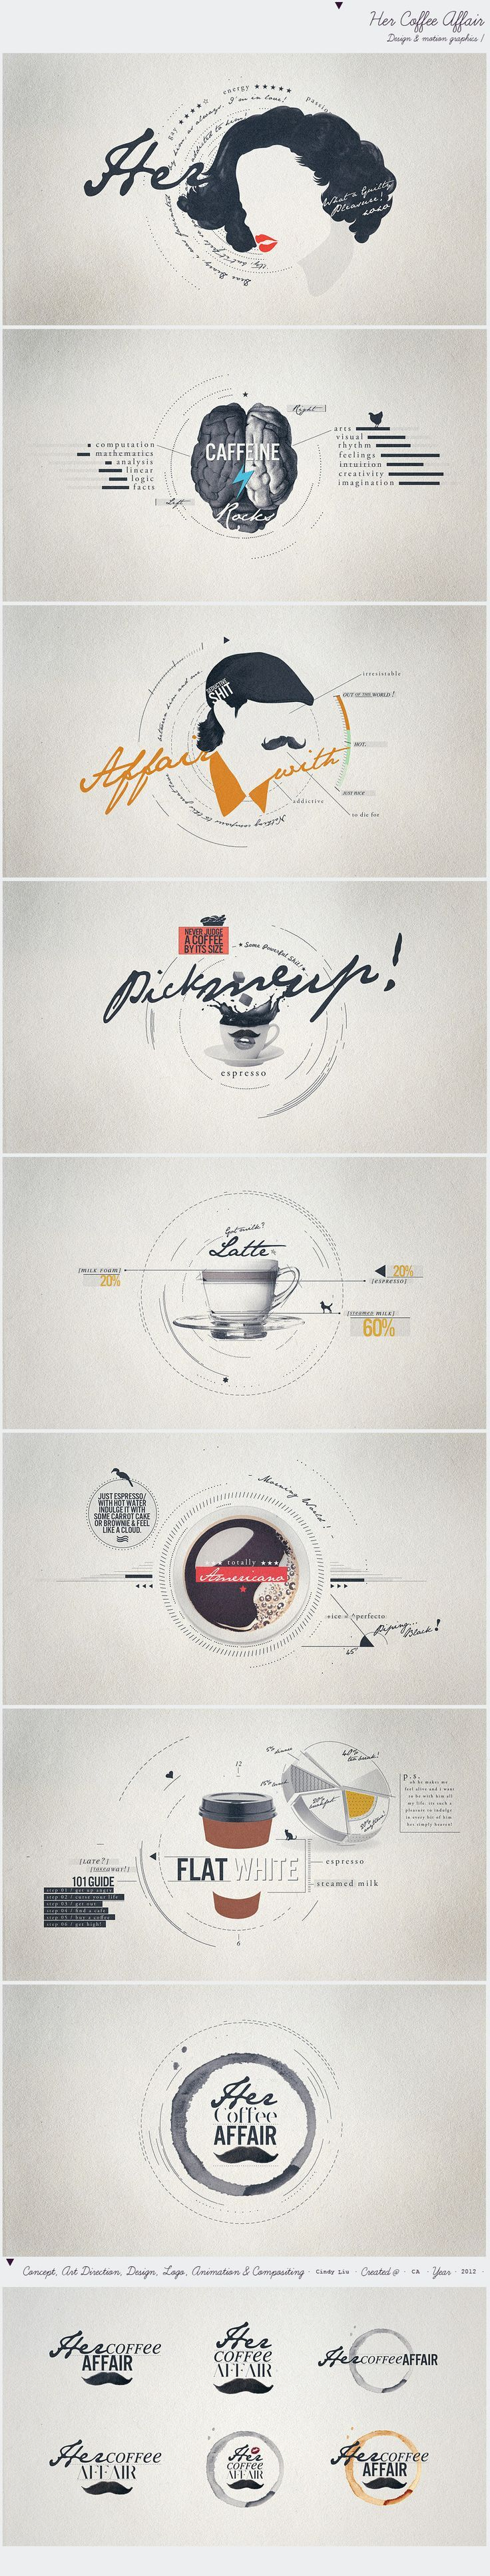 Cool Web Design on the Internet, Her Coffee Affair. #webdesign #webdevelopment #website @ http://www.pinterest.com... #infographics